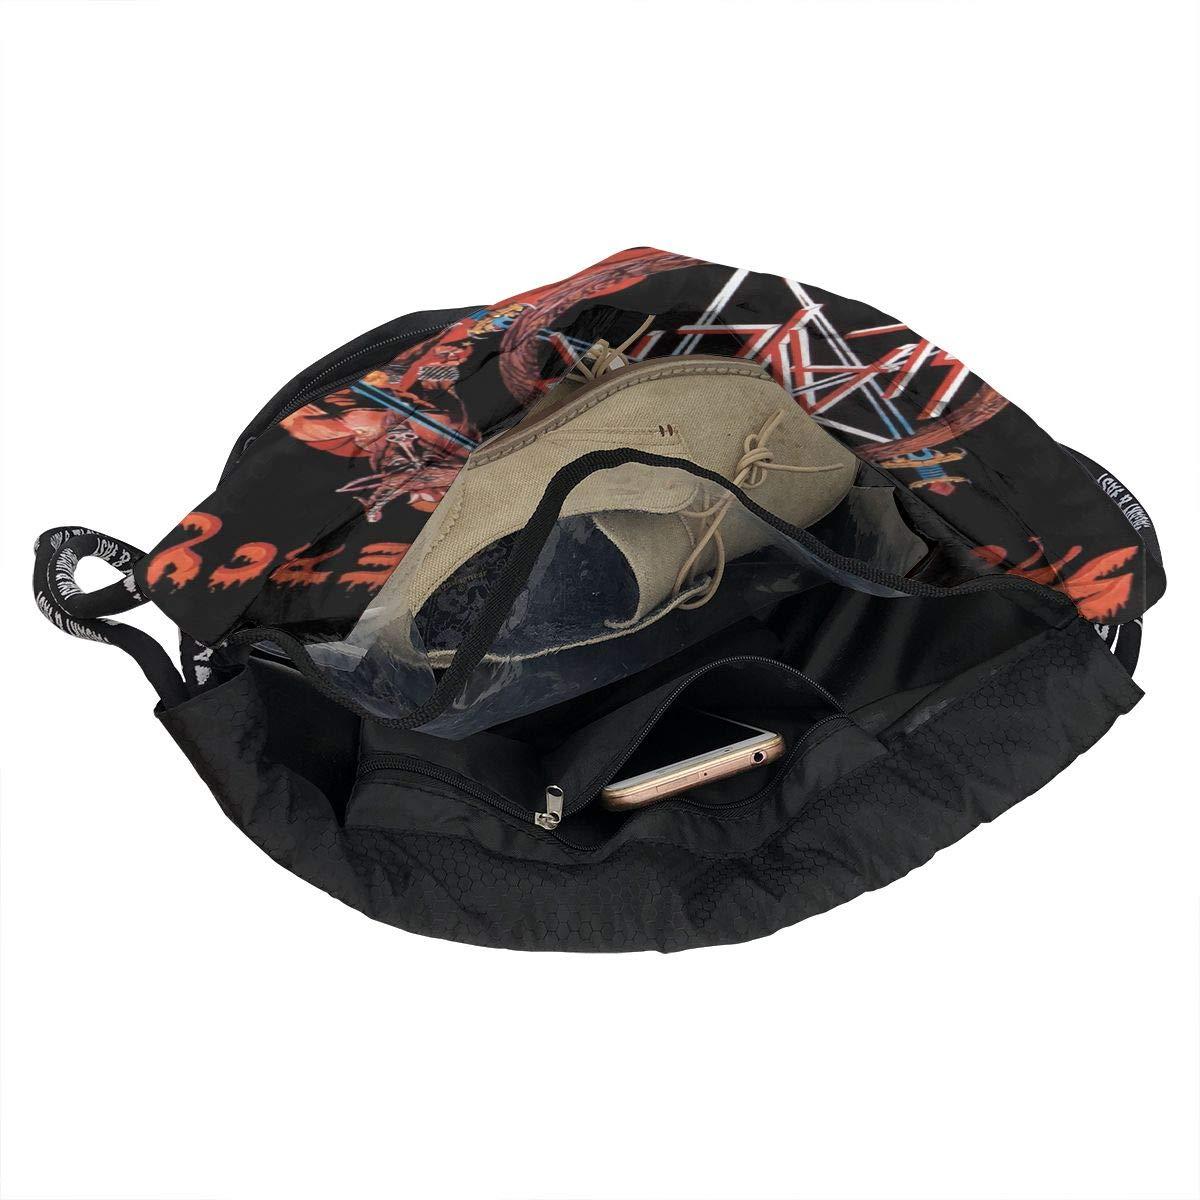 Chenjunyi Slayer Show No Mercy Drawstring Backpack Foldable Gym Tote Dance Bag for Swimming Shopping Sports Women Men Boys Girls